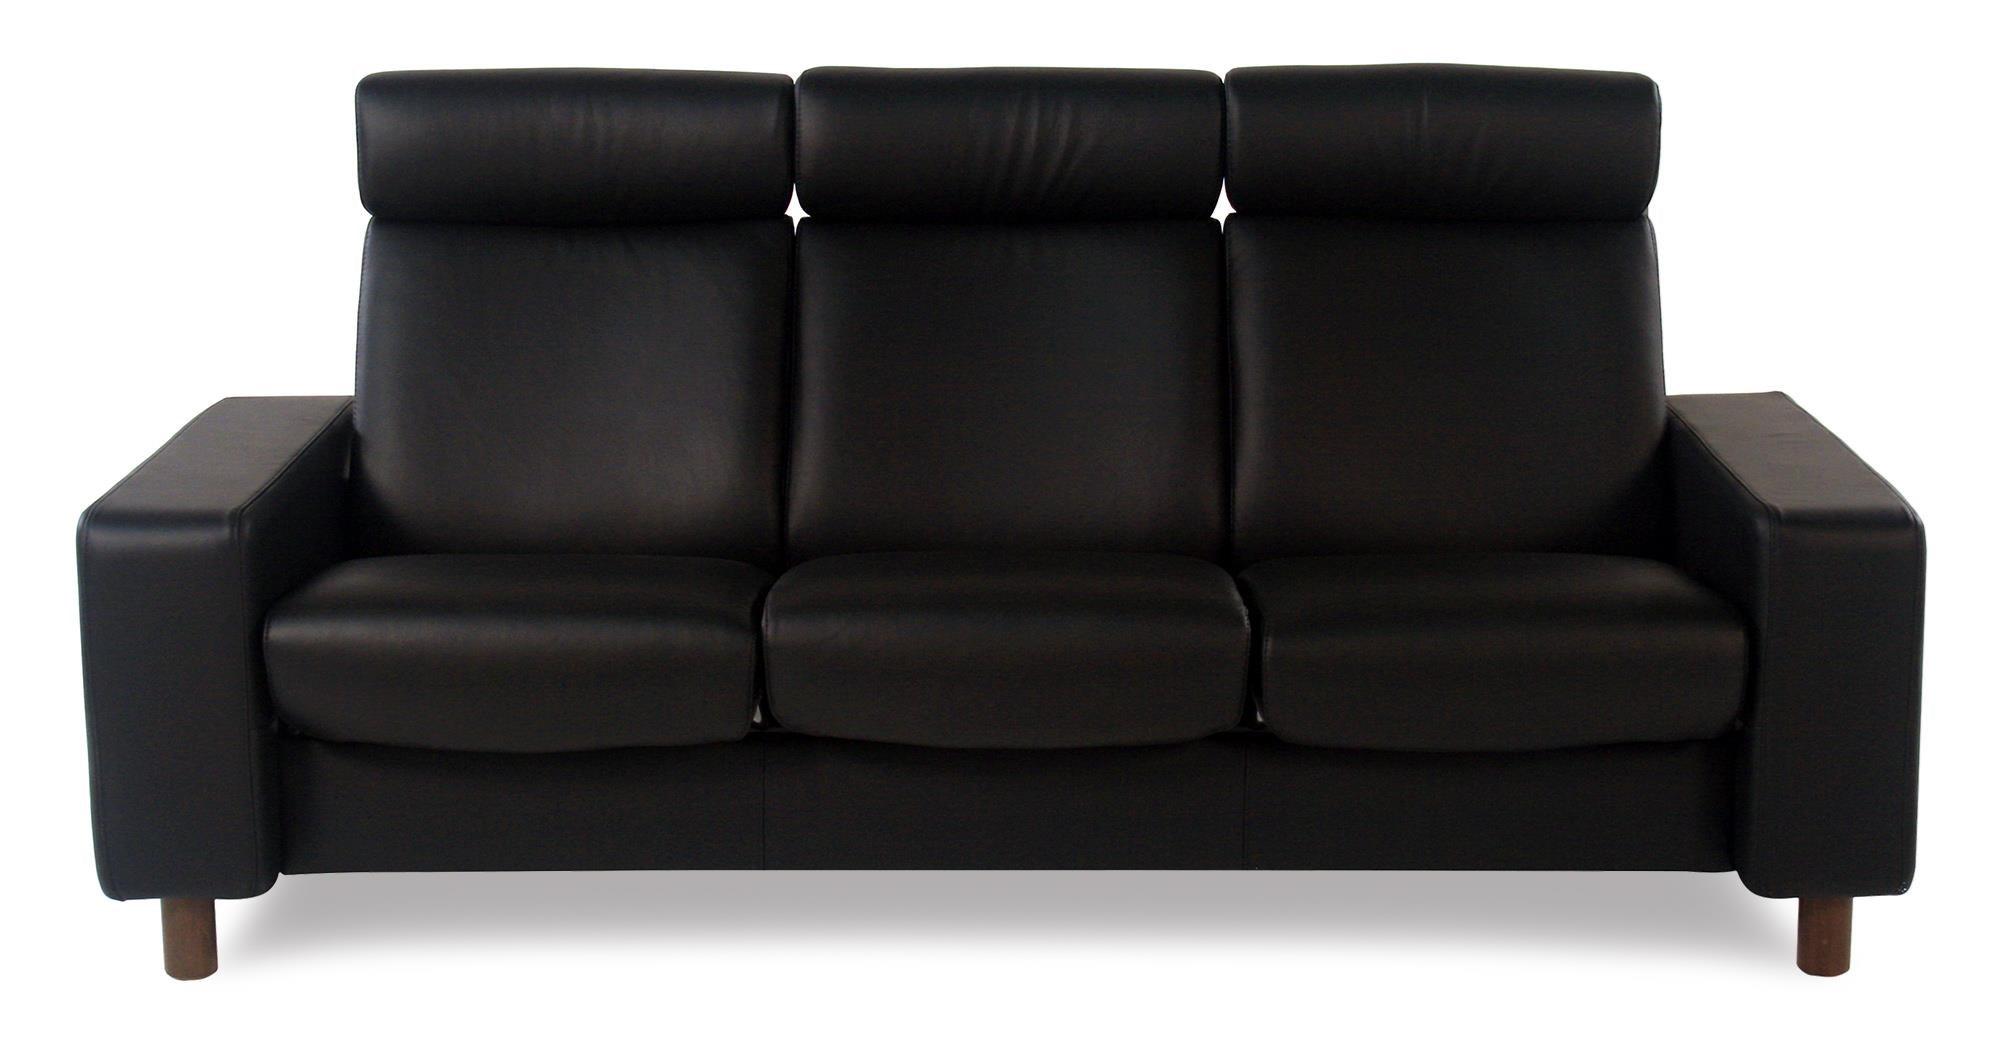 stressless by ekornes stressless pause 3 seat high back sofa paloma black w walnut finish. Black Bedroom Furniture Sets. Home Design Ideas